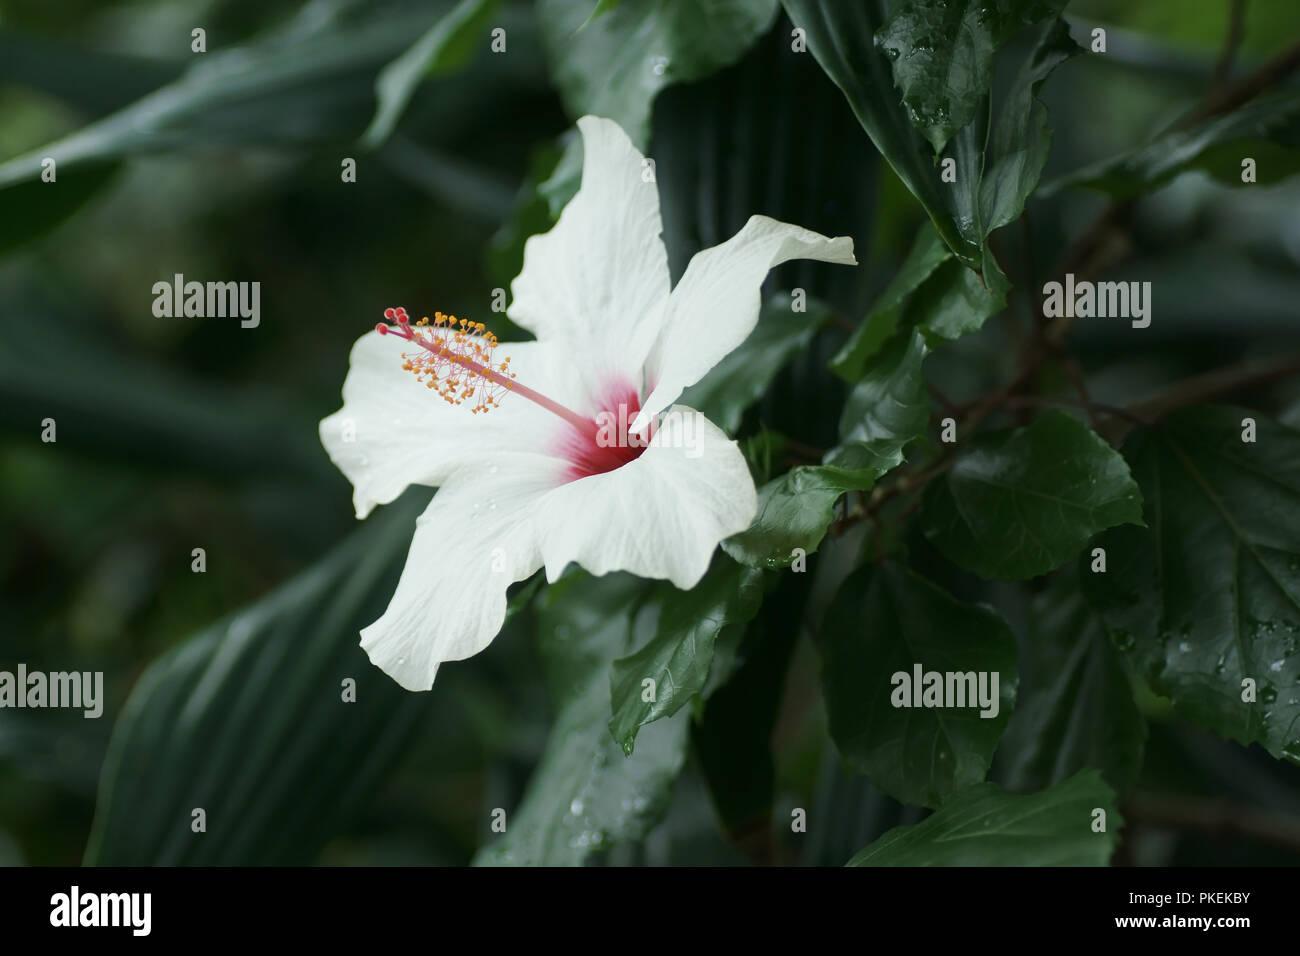 Hibiscus White Wings Stock Photo 218525439 Alamy